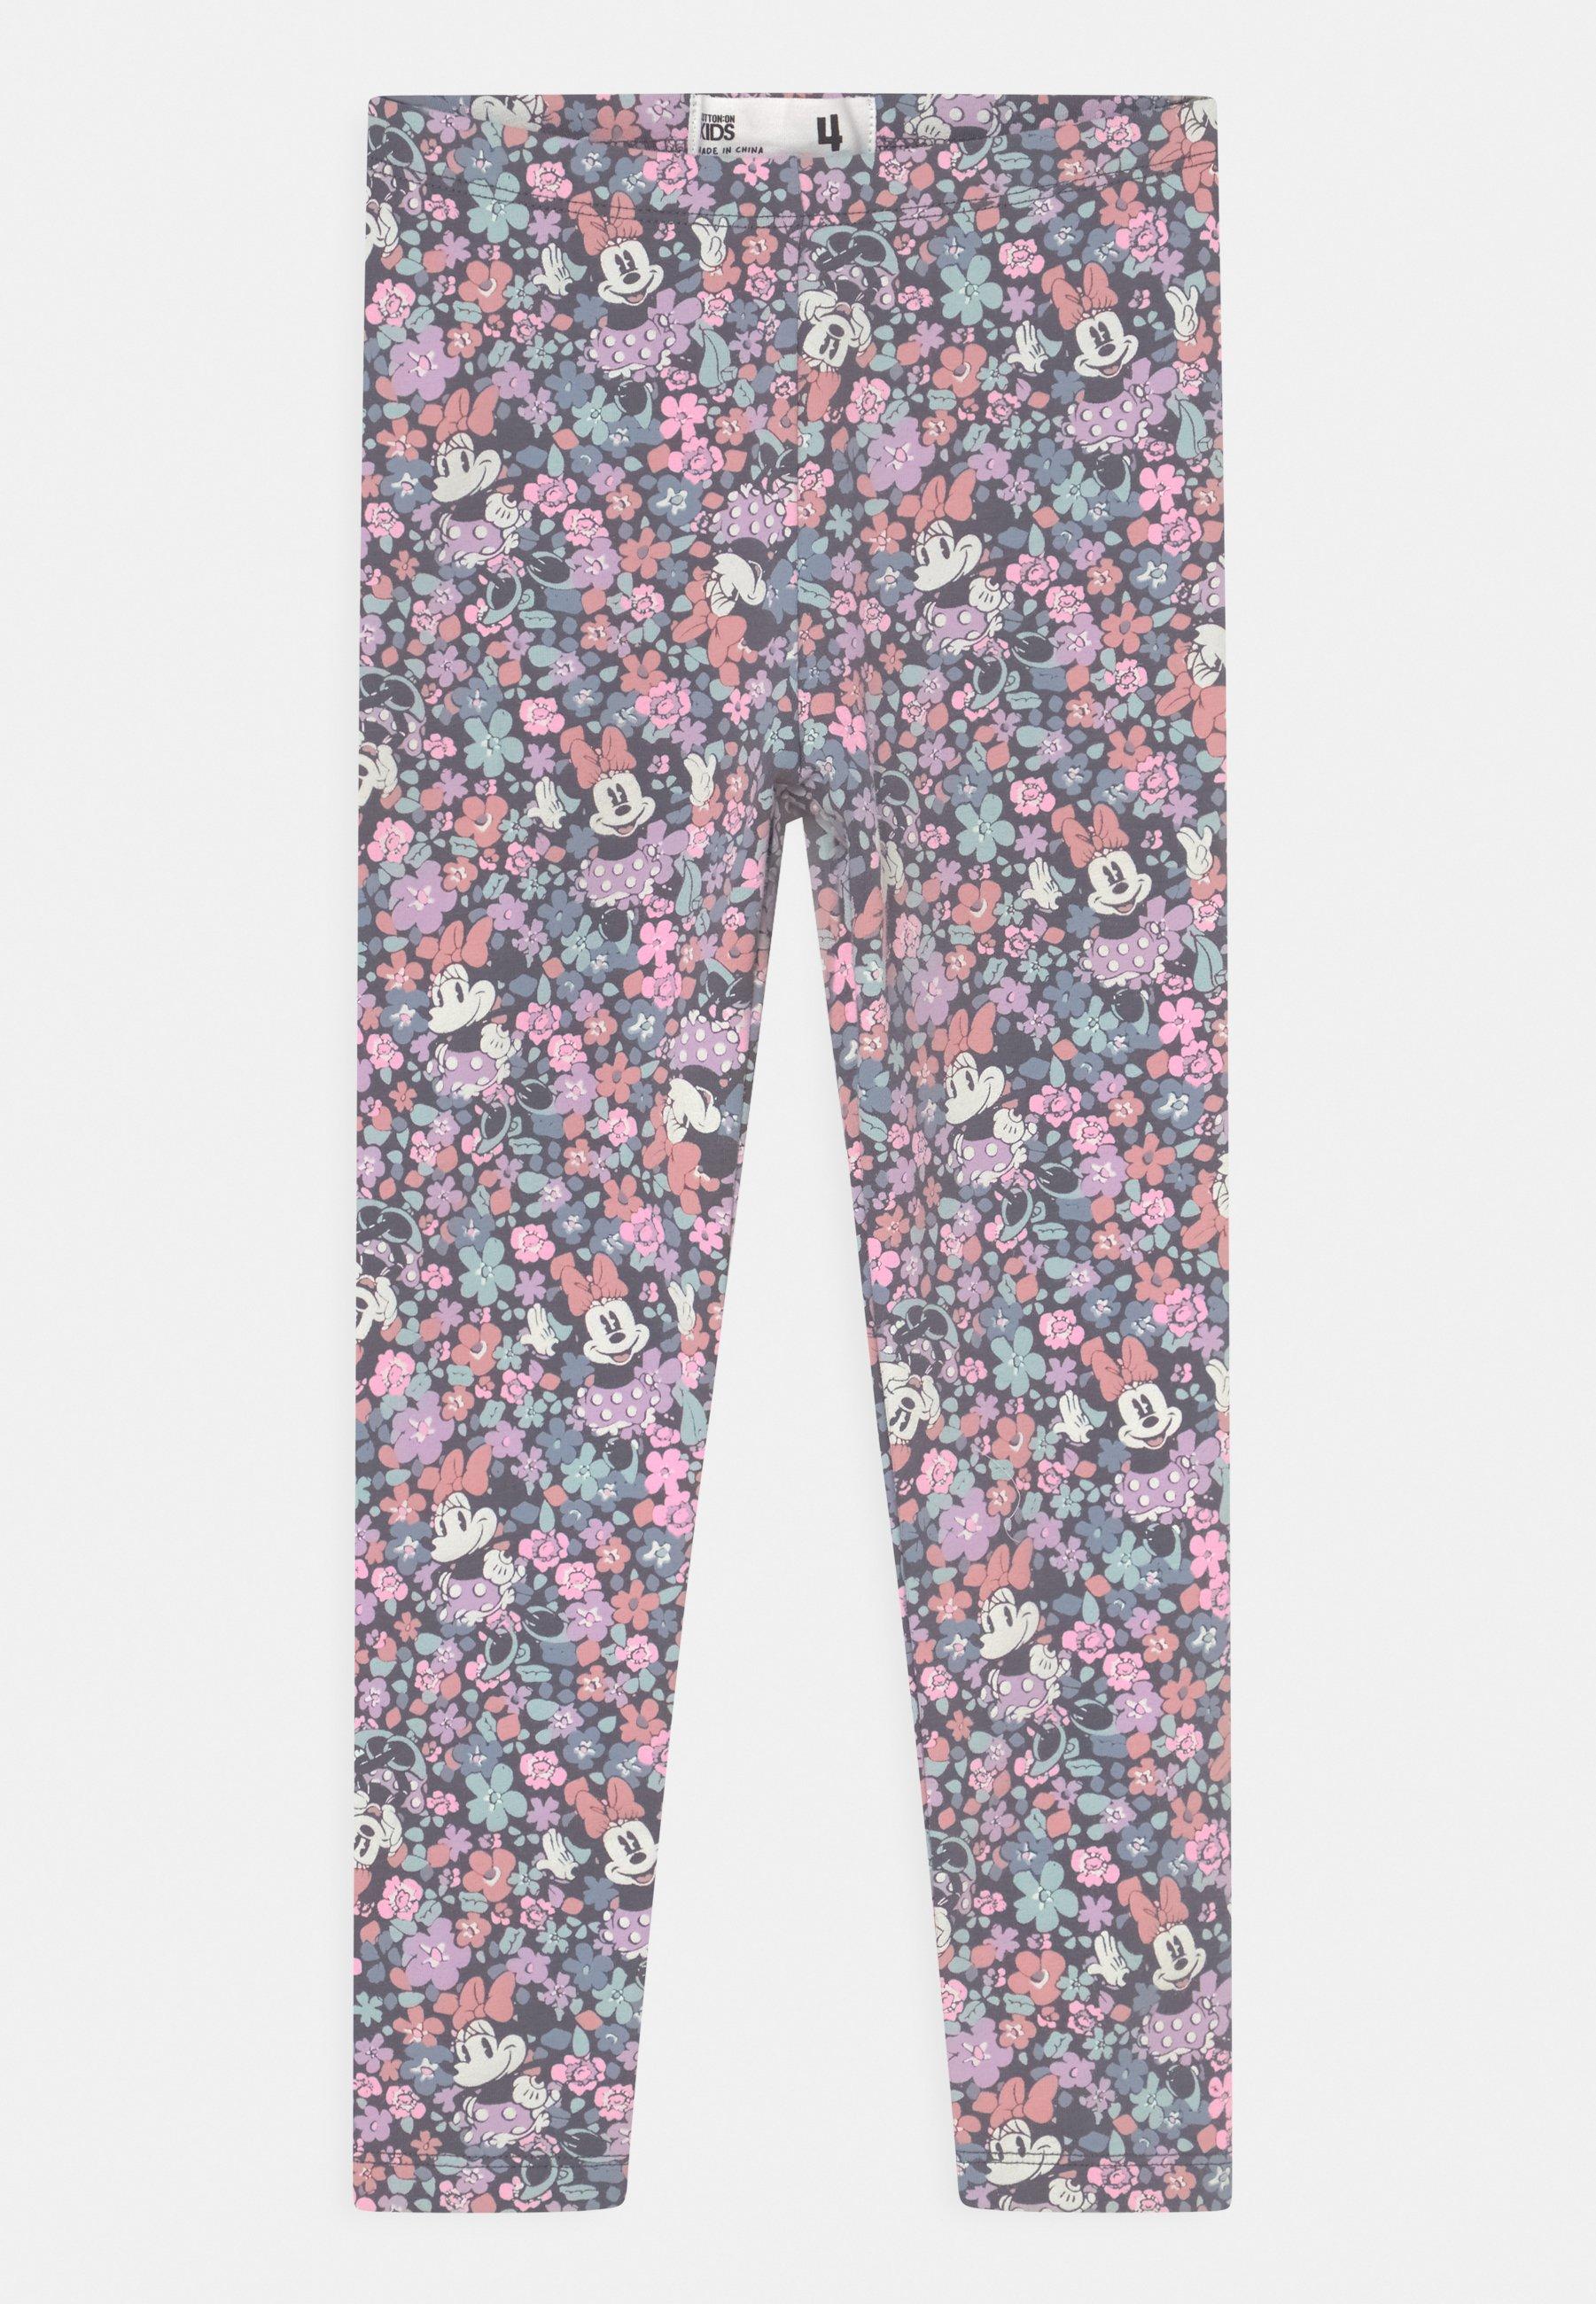 Kids MINI LICENSE HUGGIE TIGHT DISNEY - Leggings - Trousers